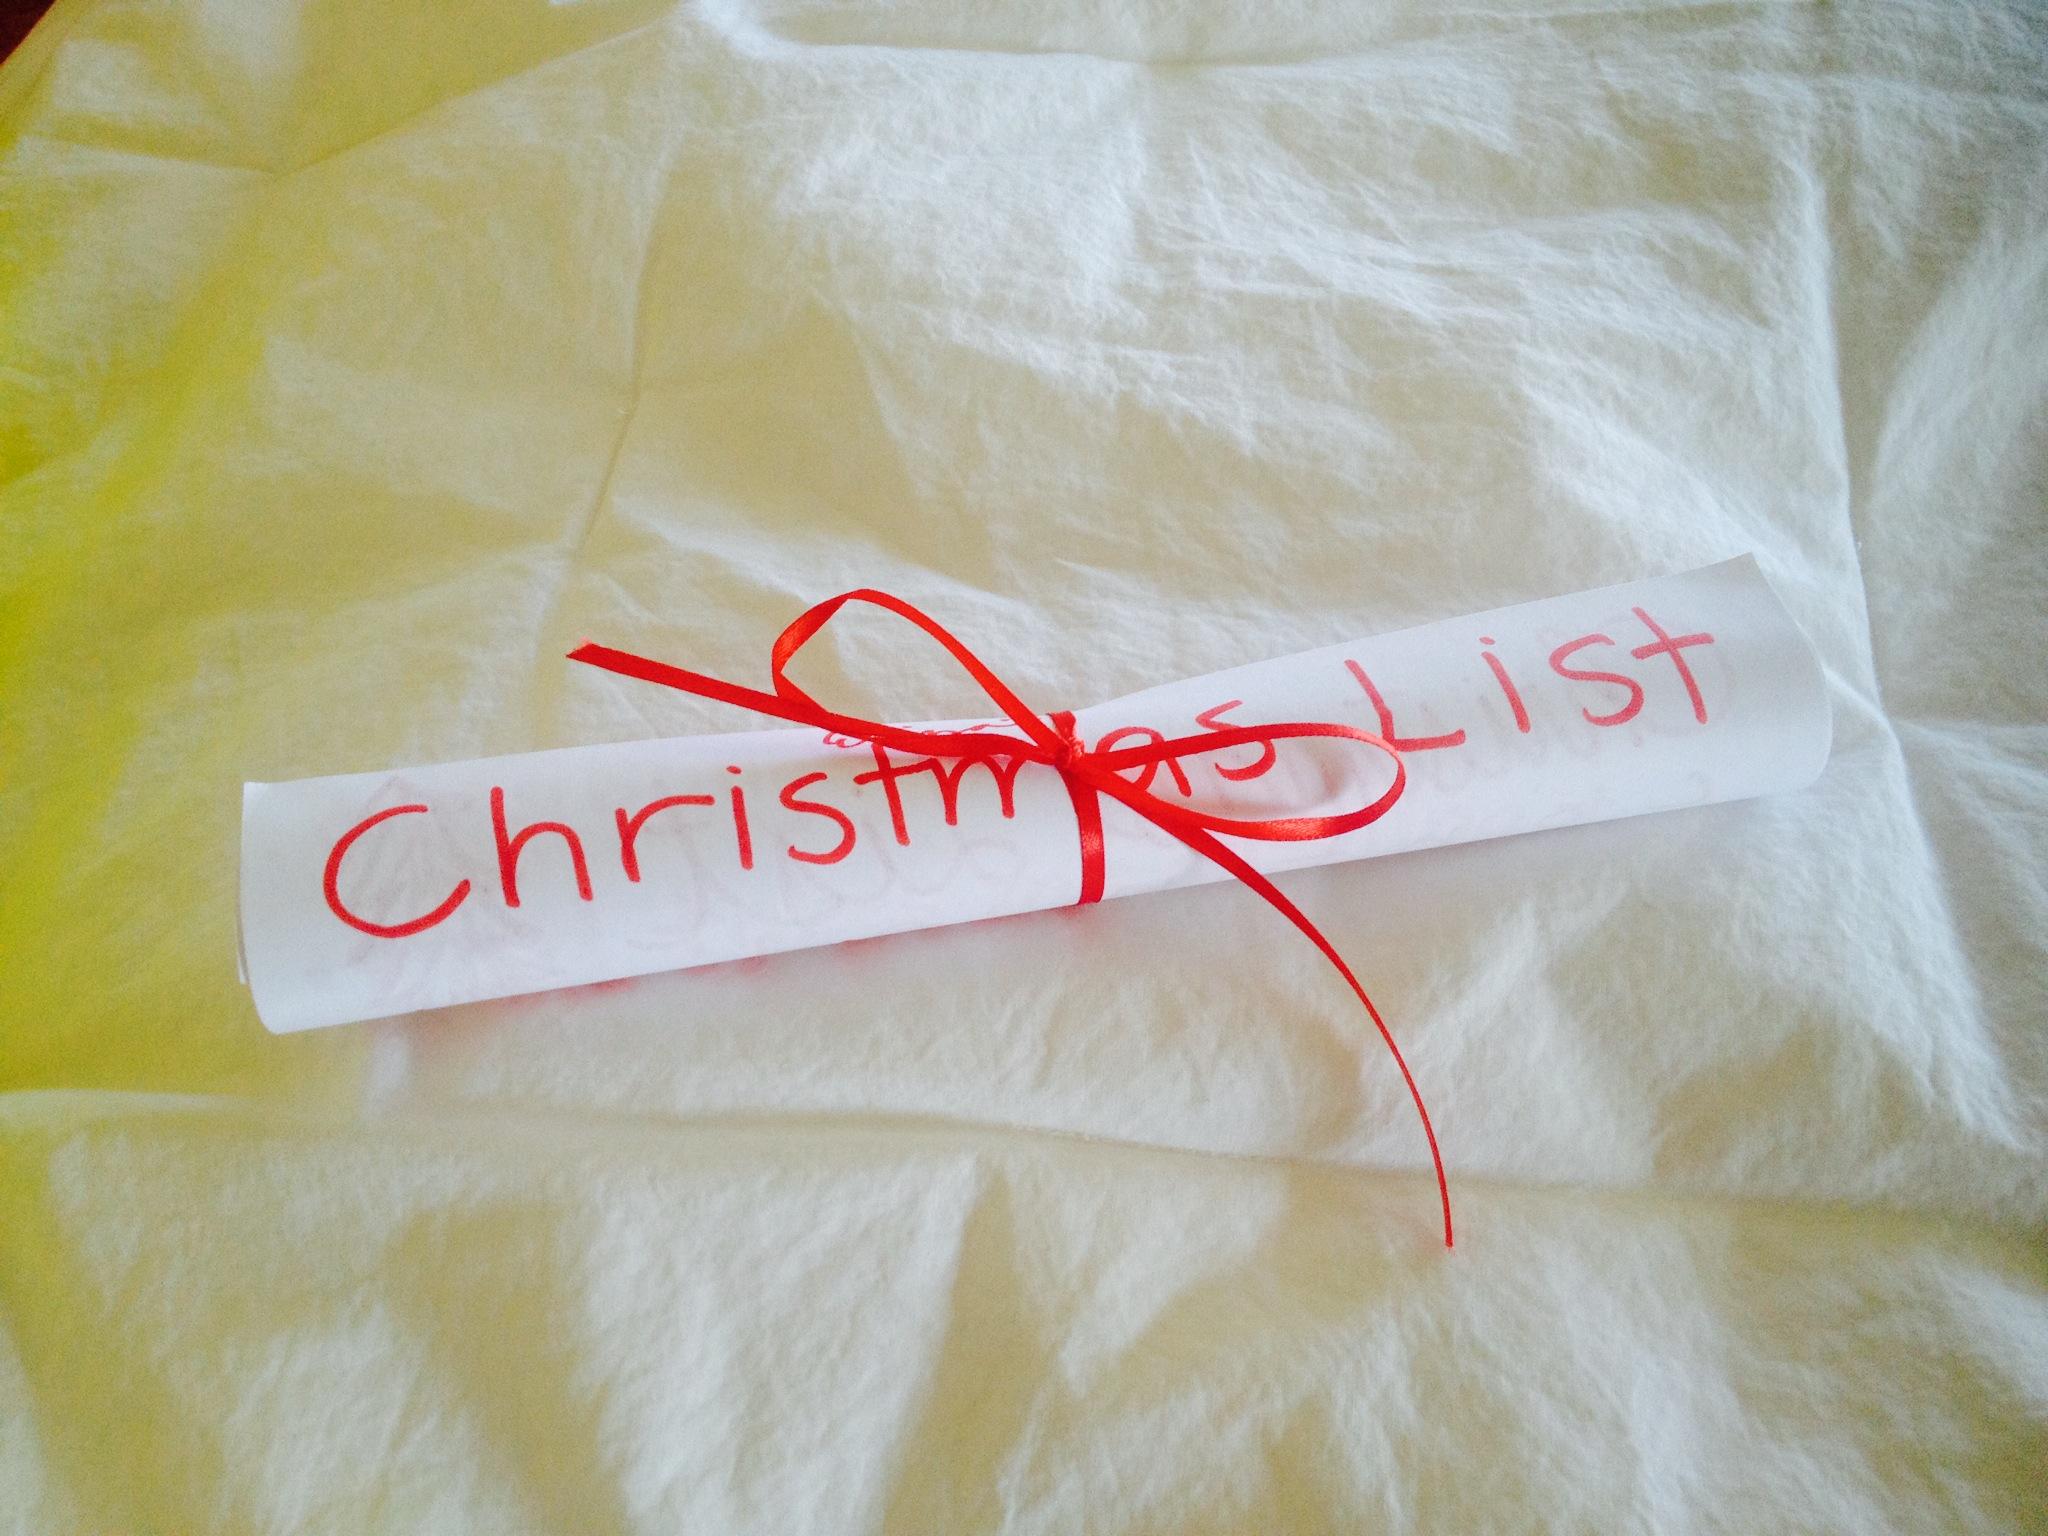 Eliza's Christmas list